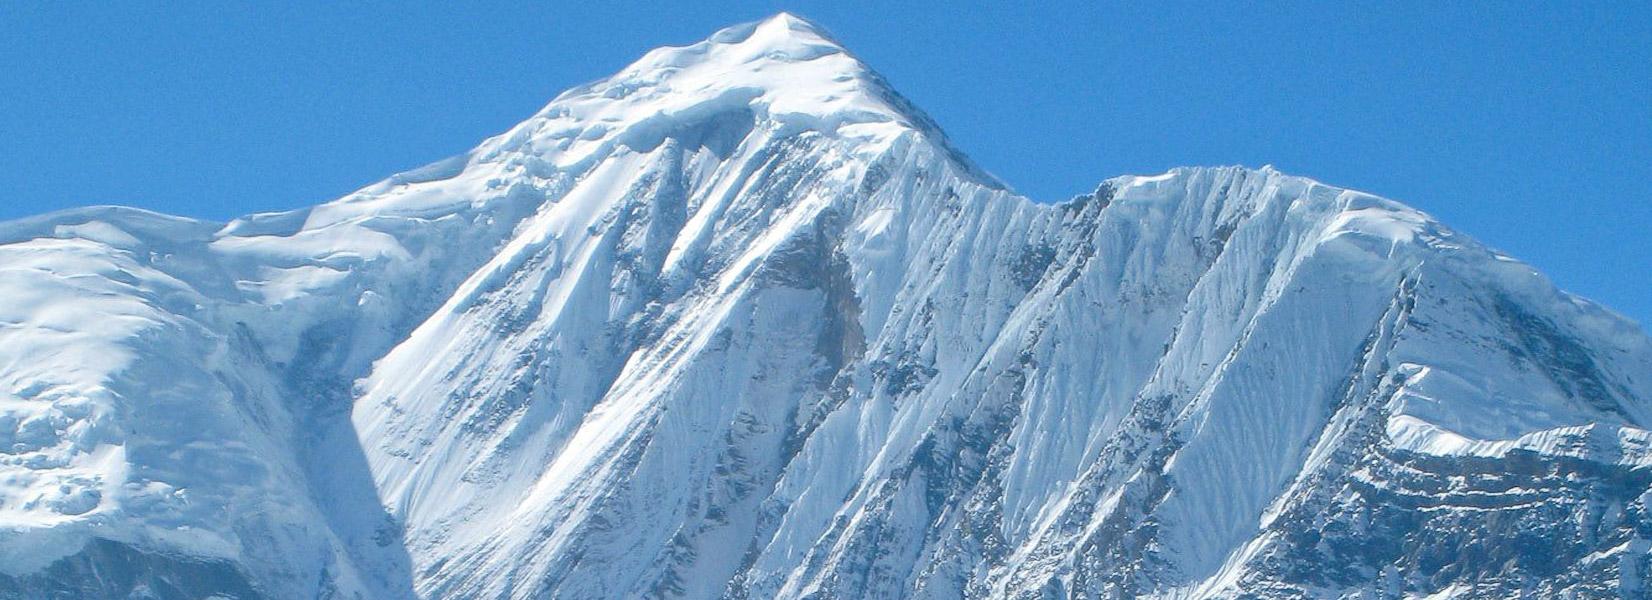 Gangapurna-Expedition